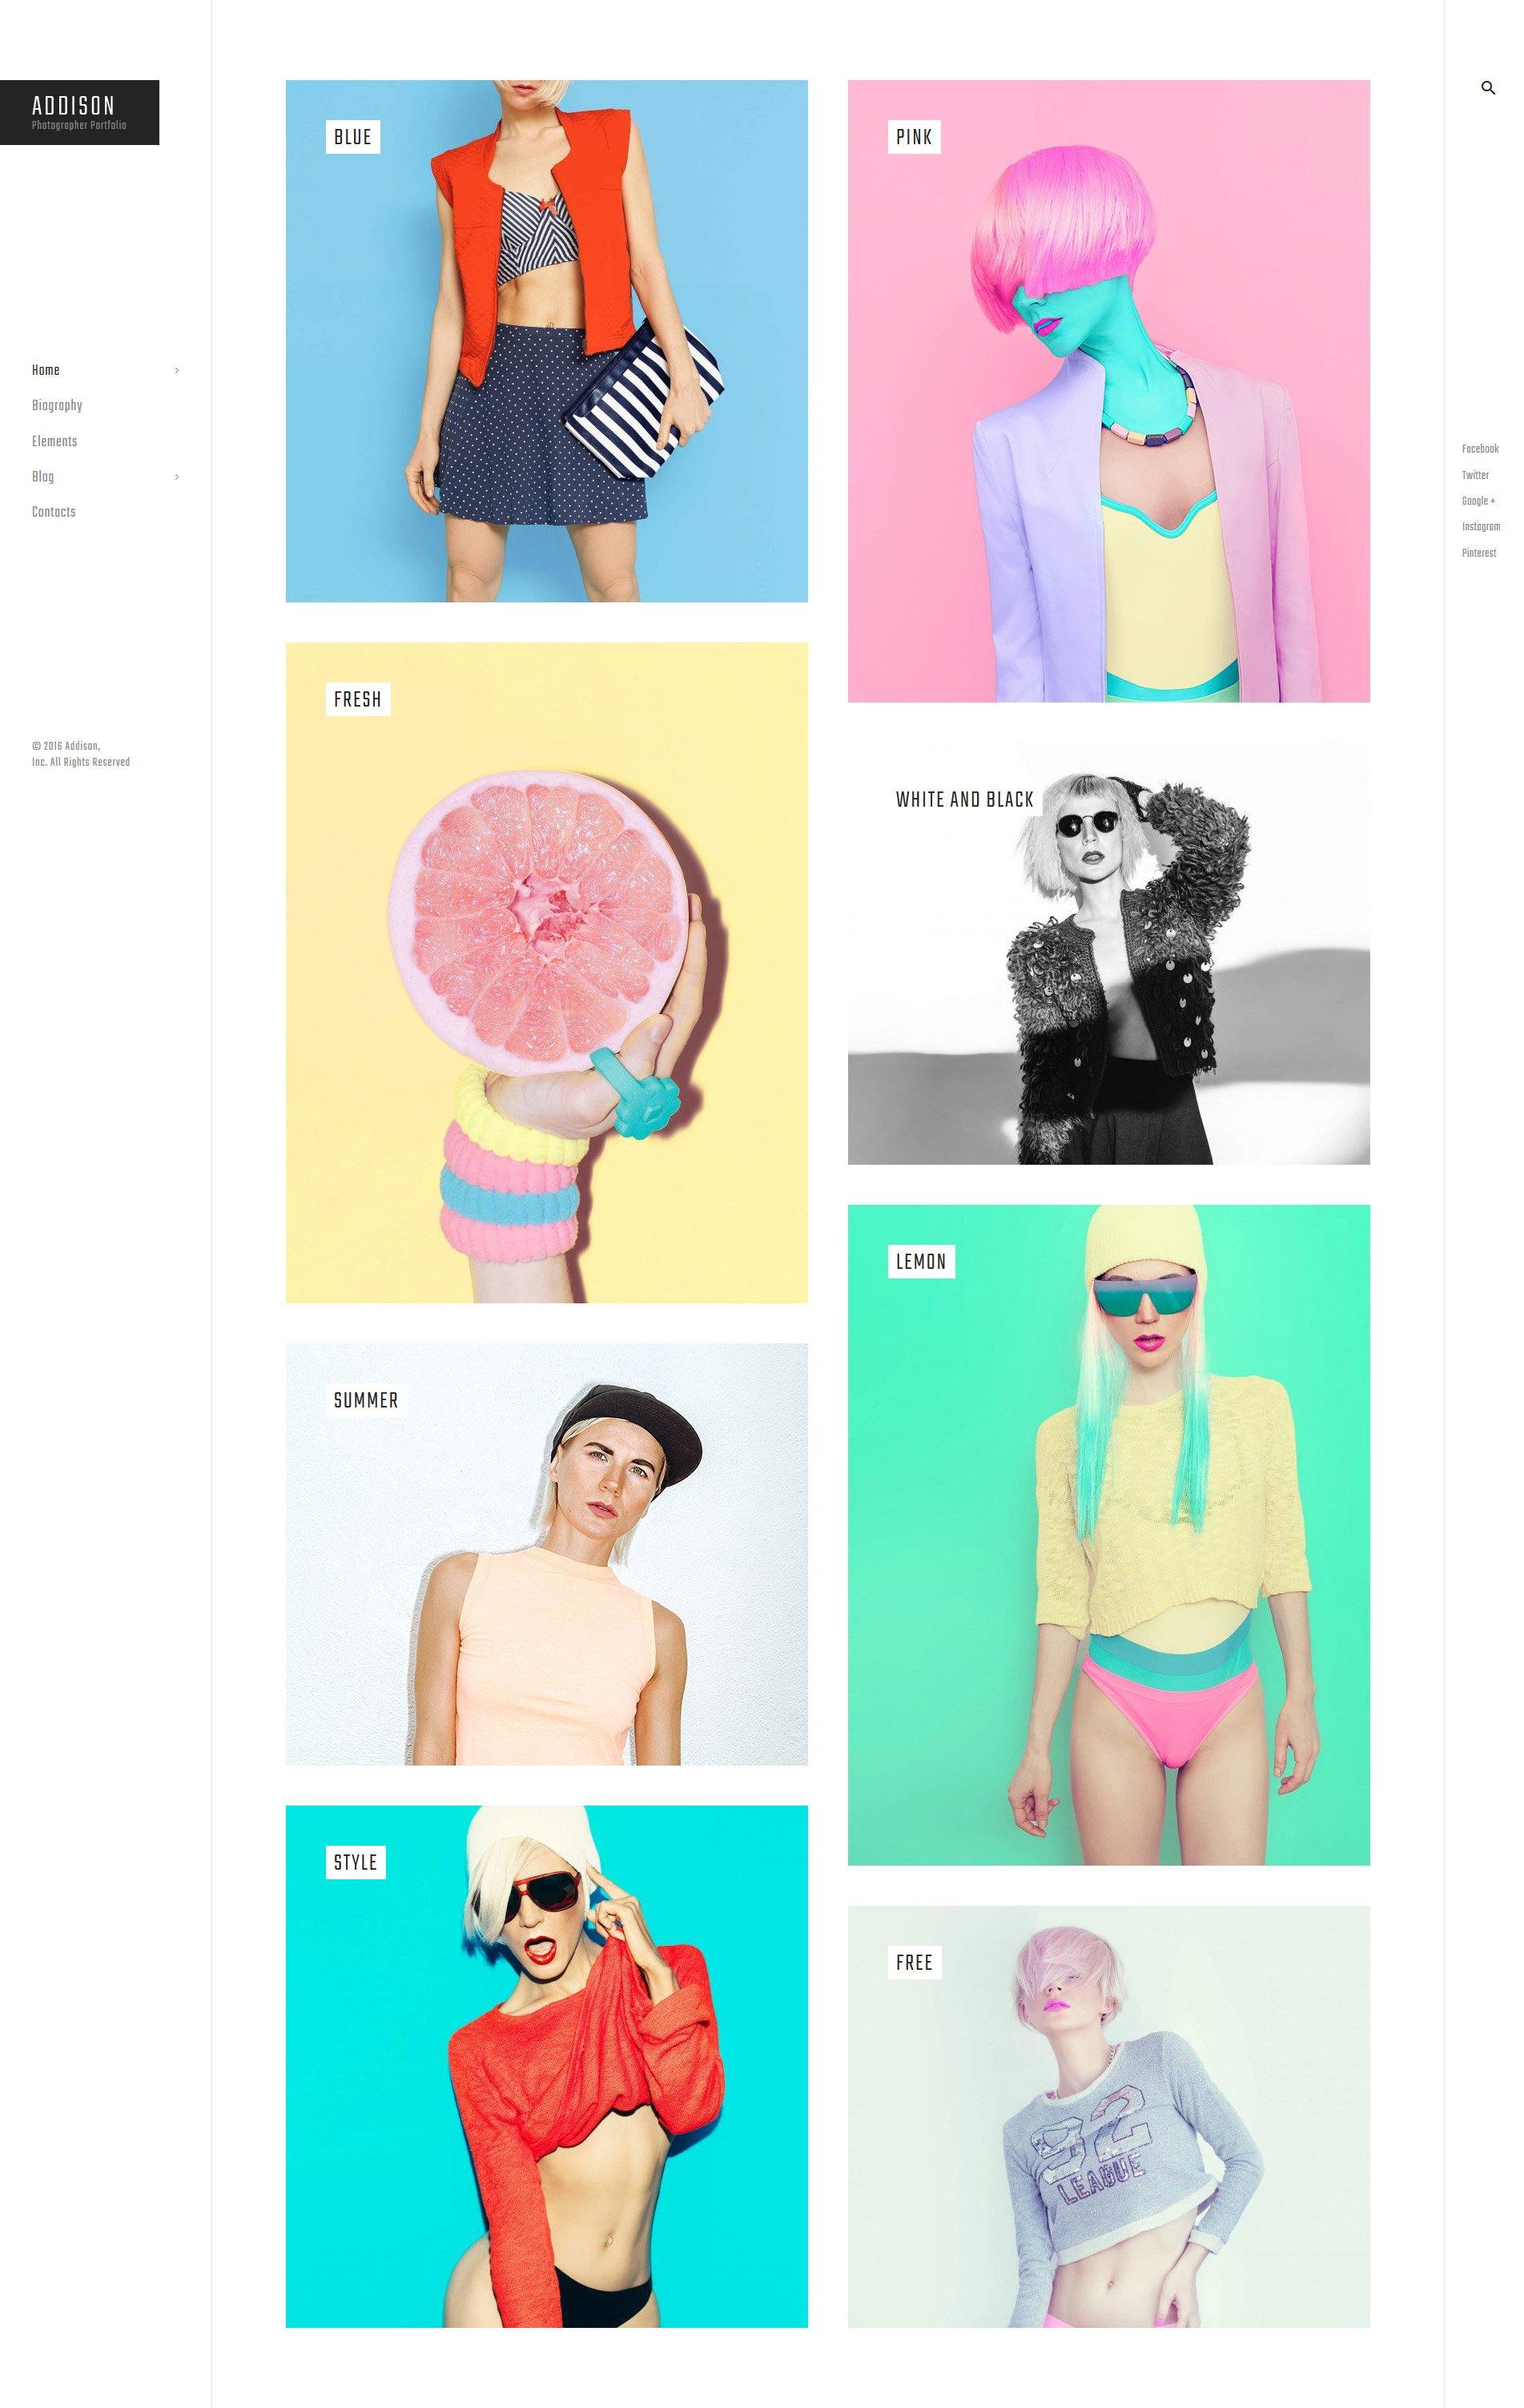 """Addison - Creative Photographer Portfolio"" - адаптивний WordPress шаблон №58912 - скріншот"